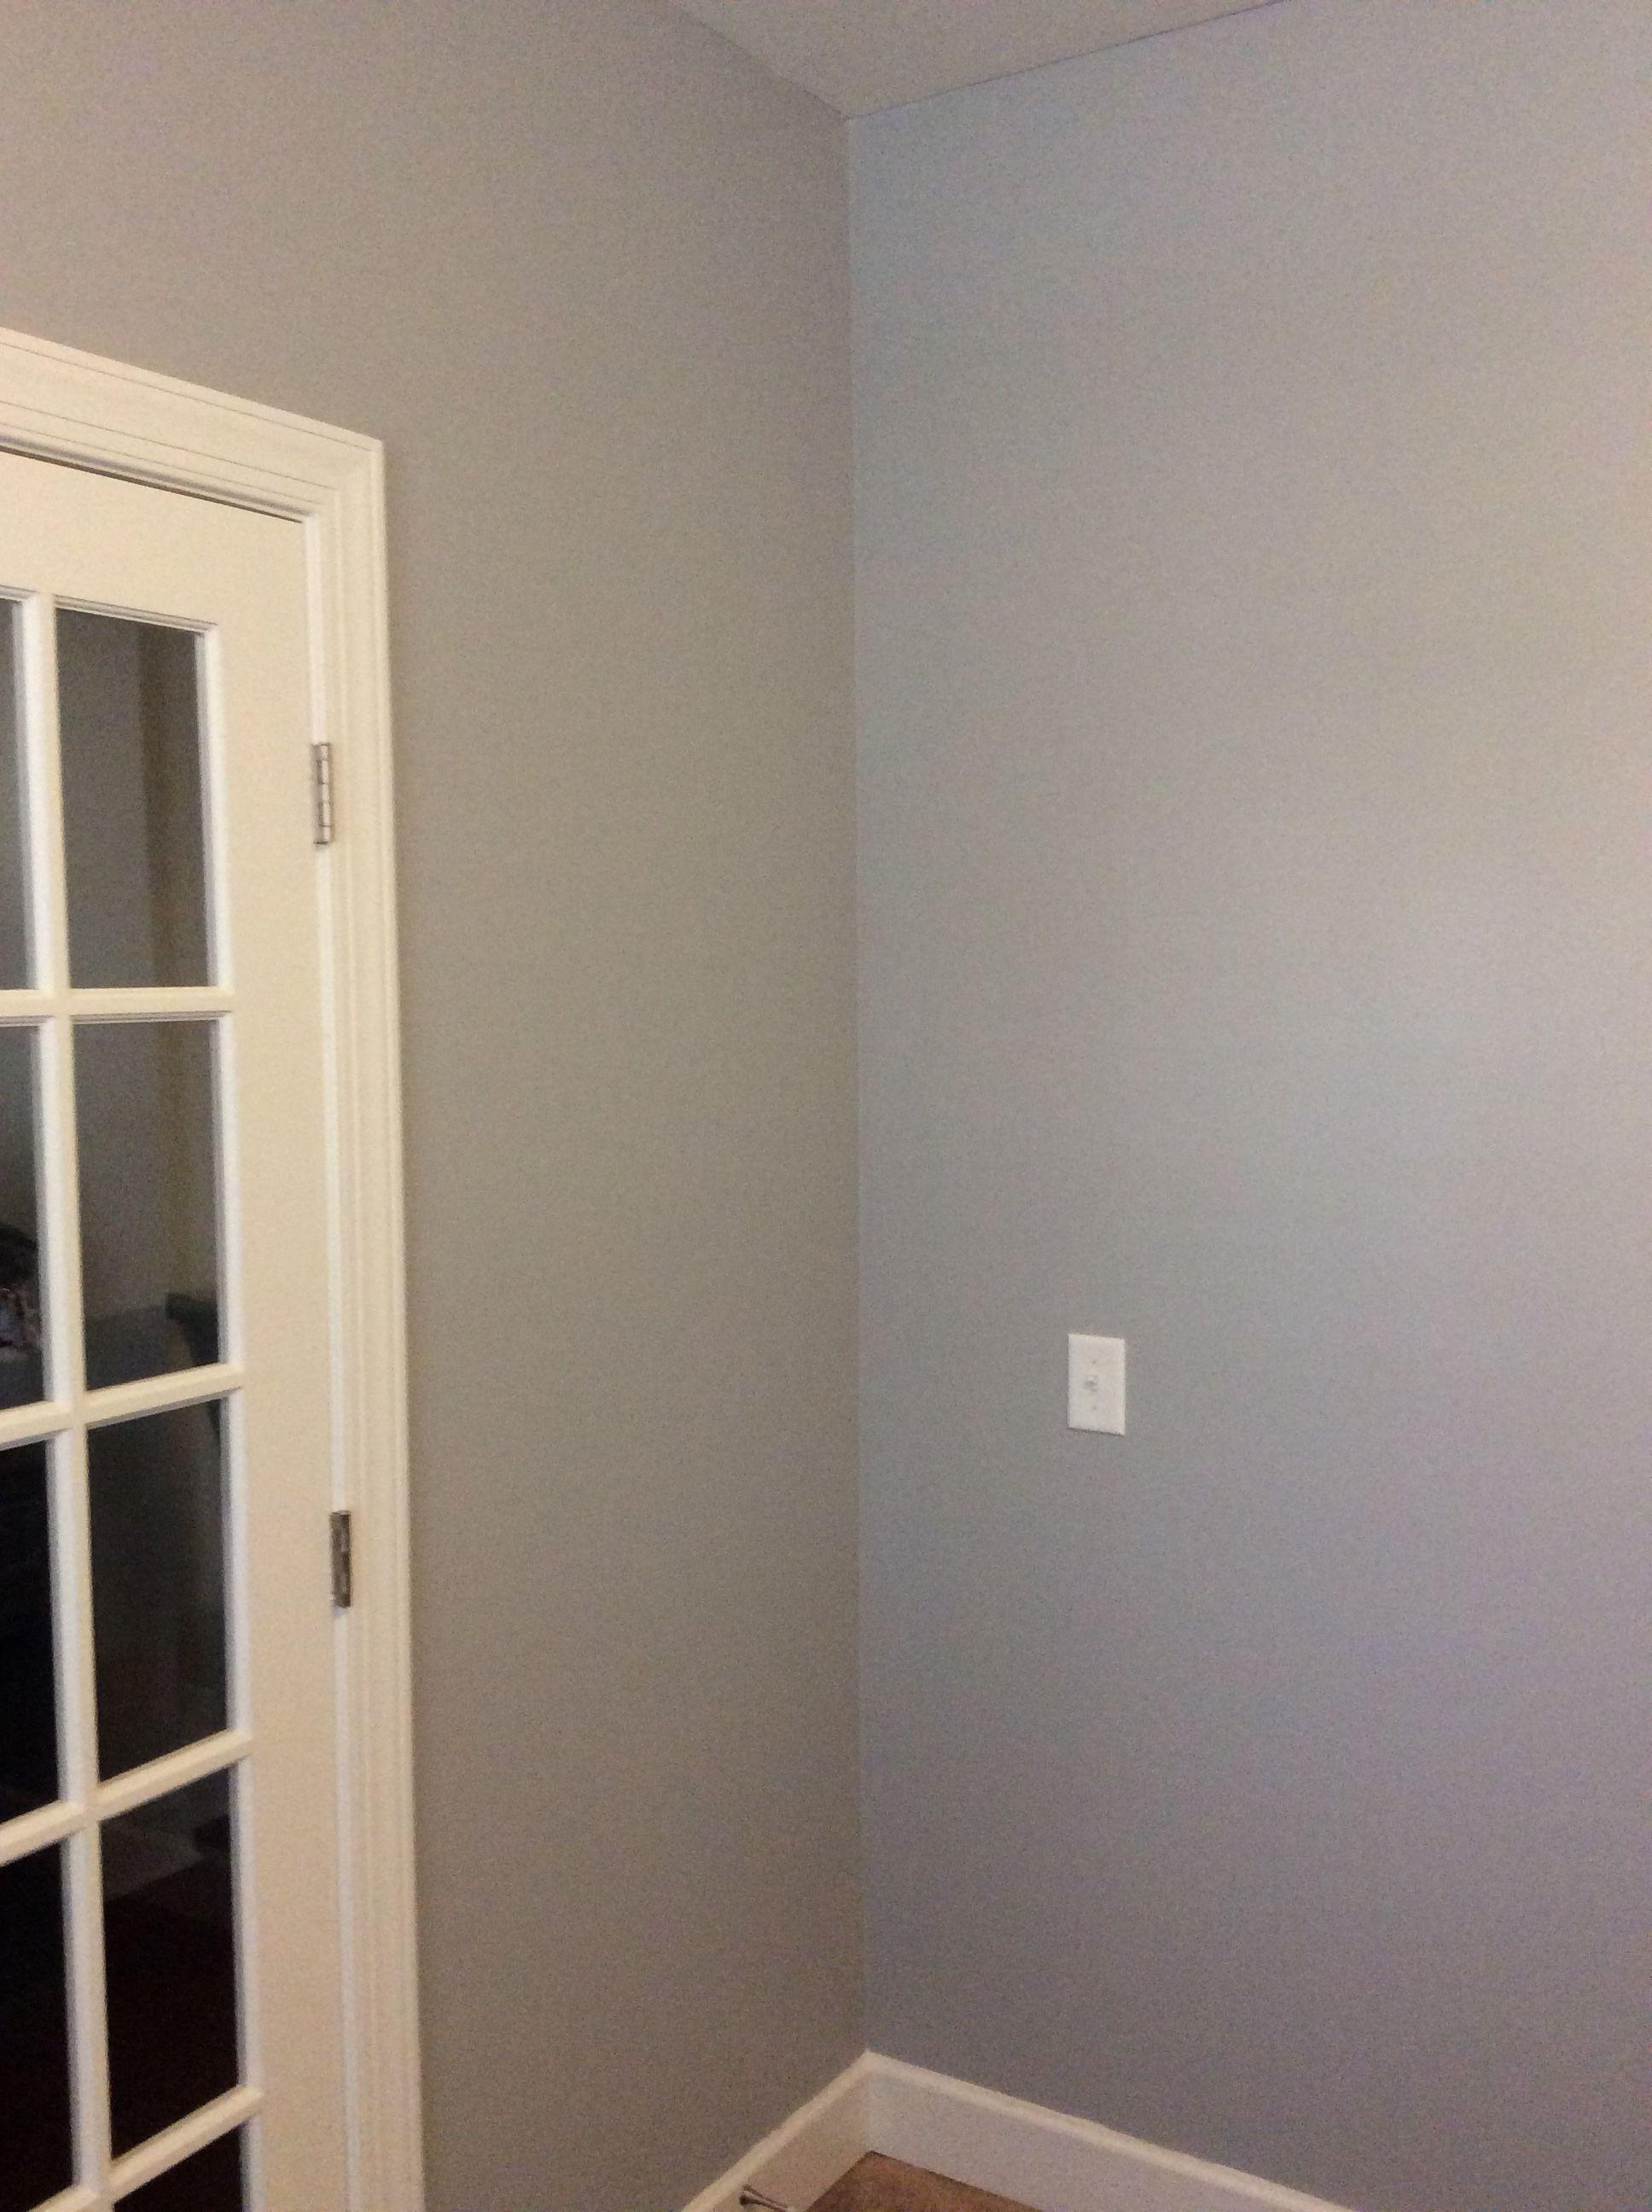 Behr Marquee Matte In French Silver Interior Wall Colors Bedroom Wall Colors Behr Marquee Paint